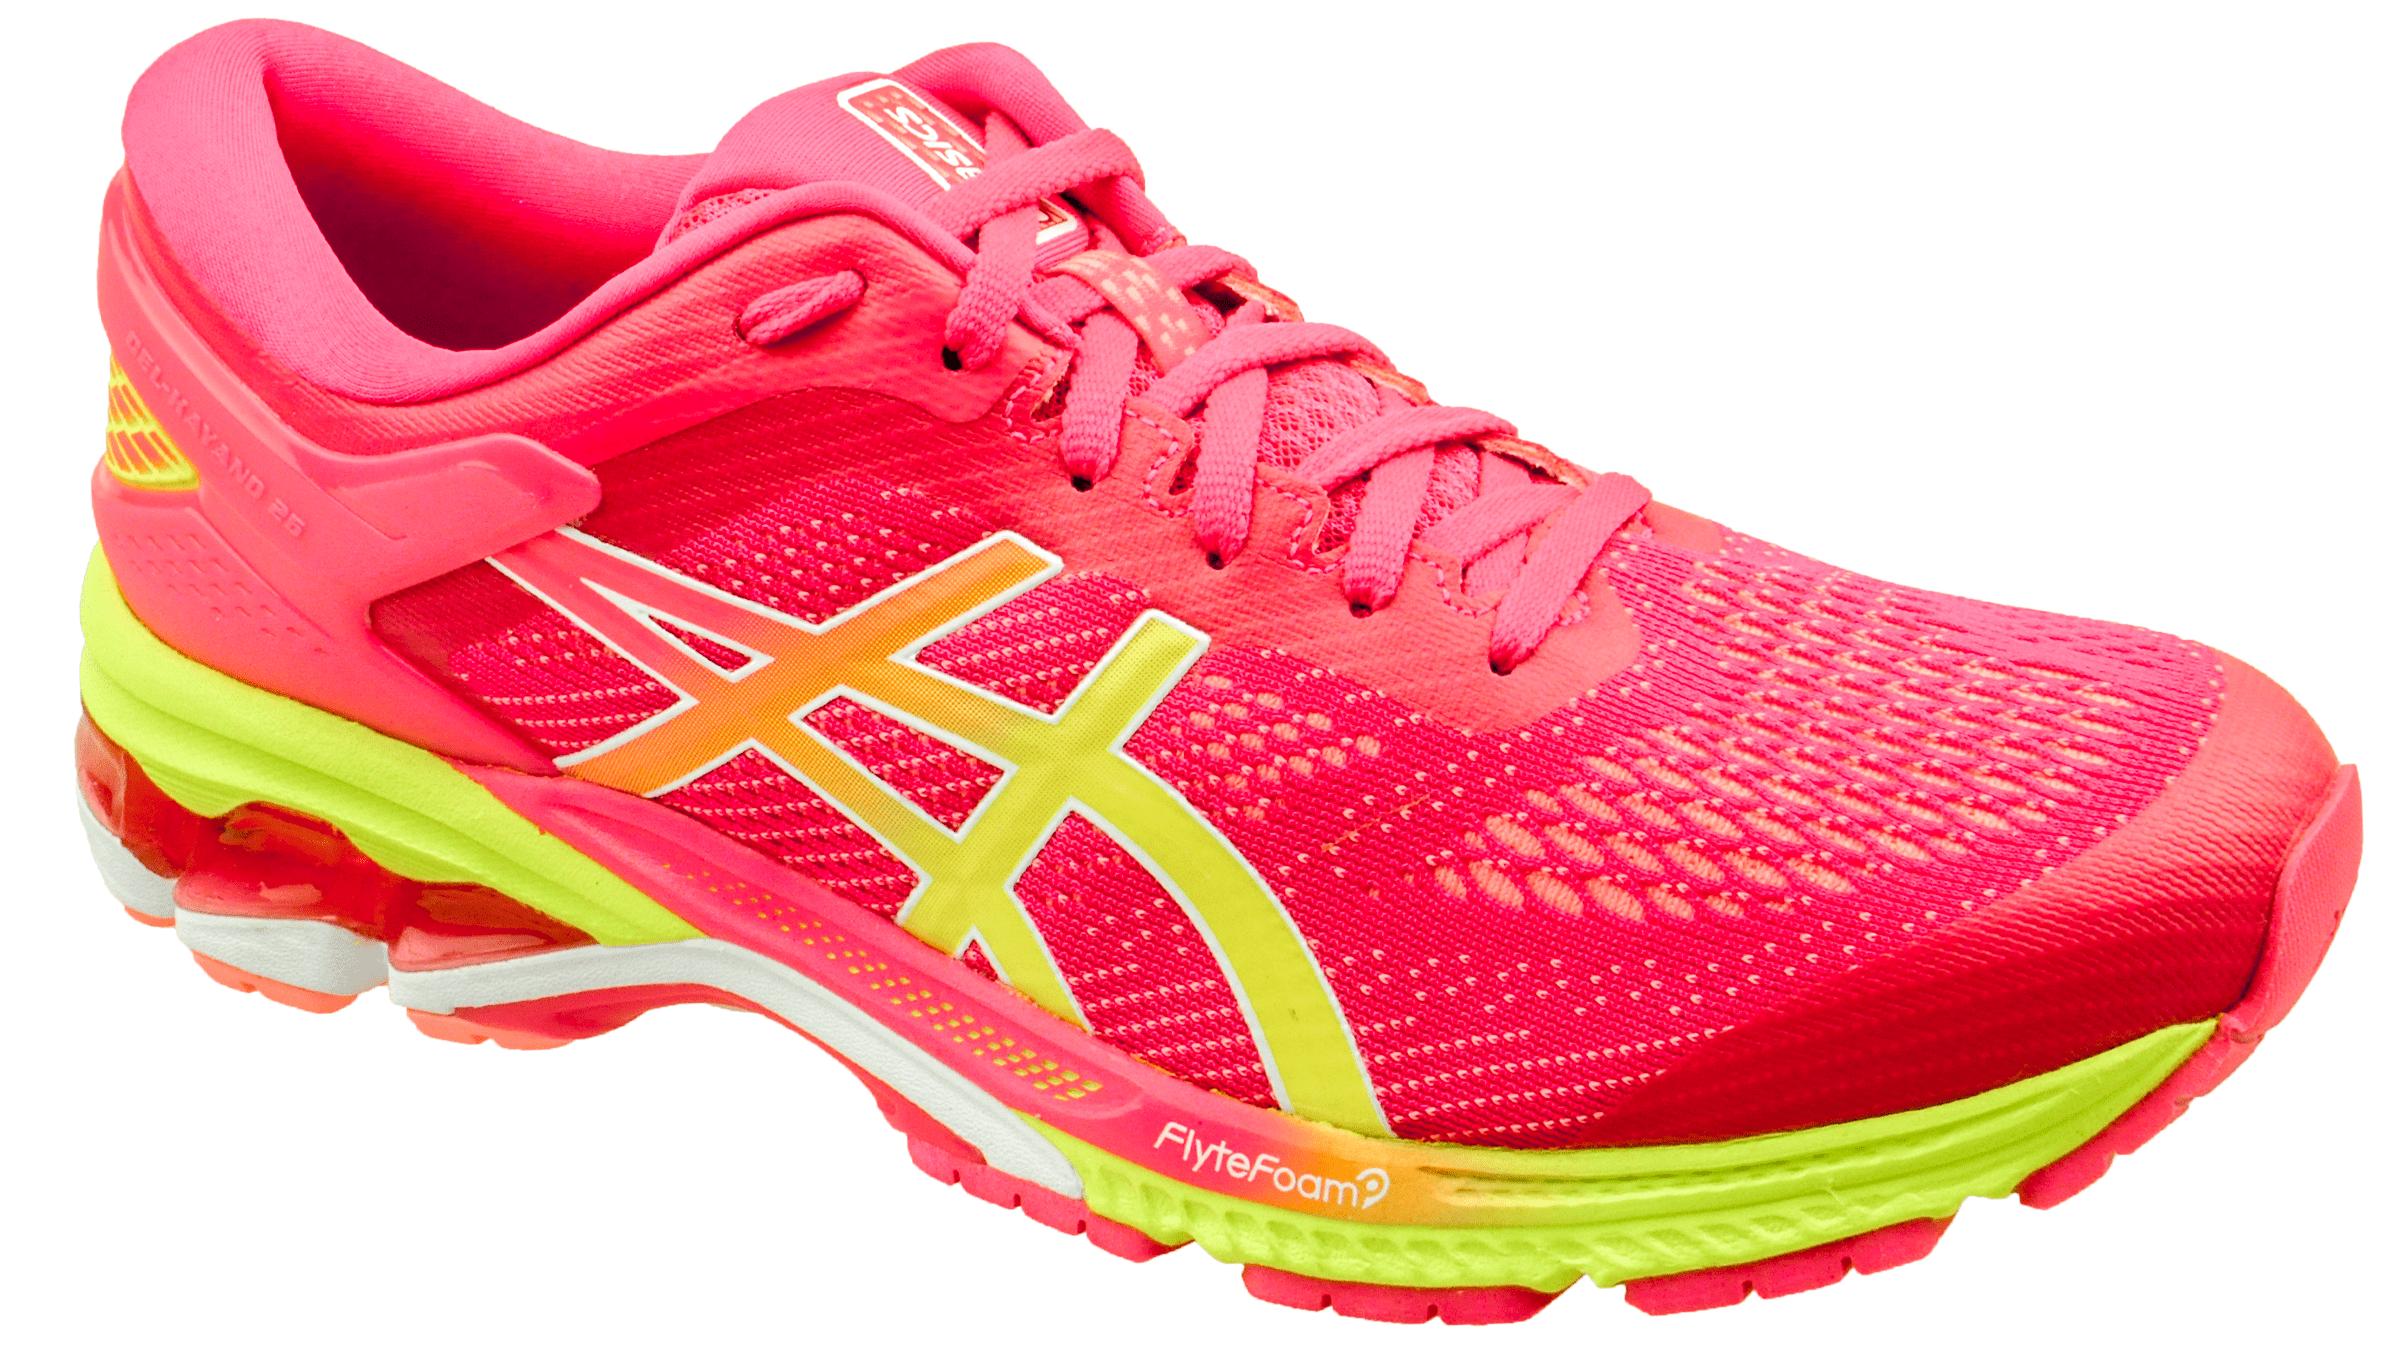 Women's GEL KAYANO 26 SP   Laser PinkSour Yuzu   Running